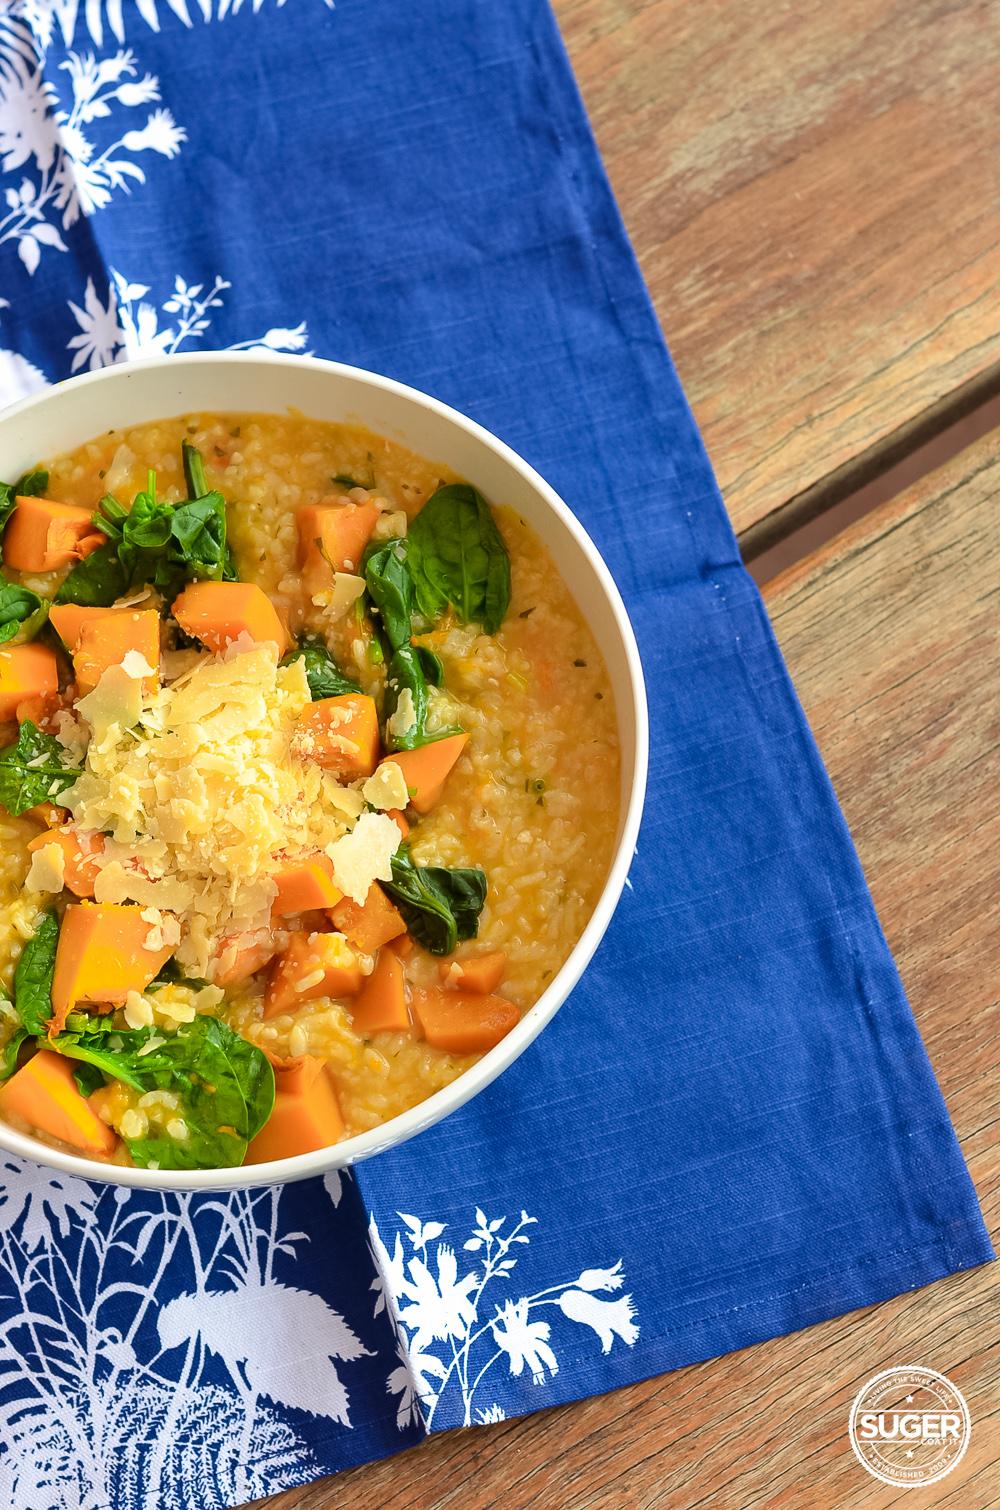 thermomix pumpkin and spinach risotto recipe-16